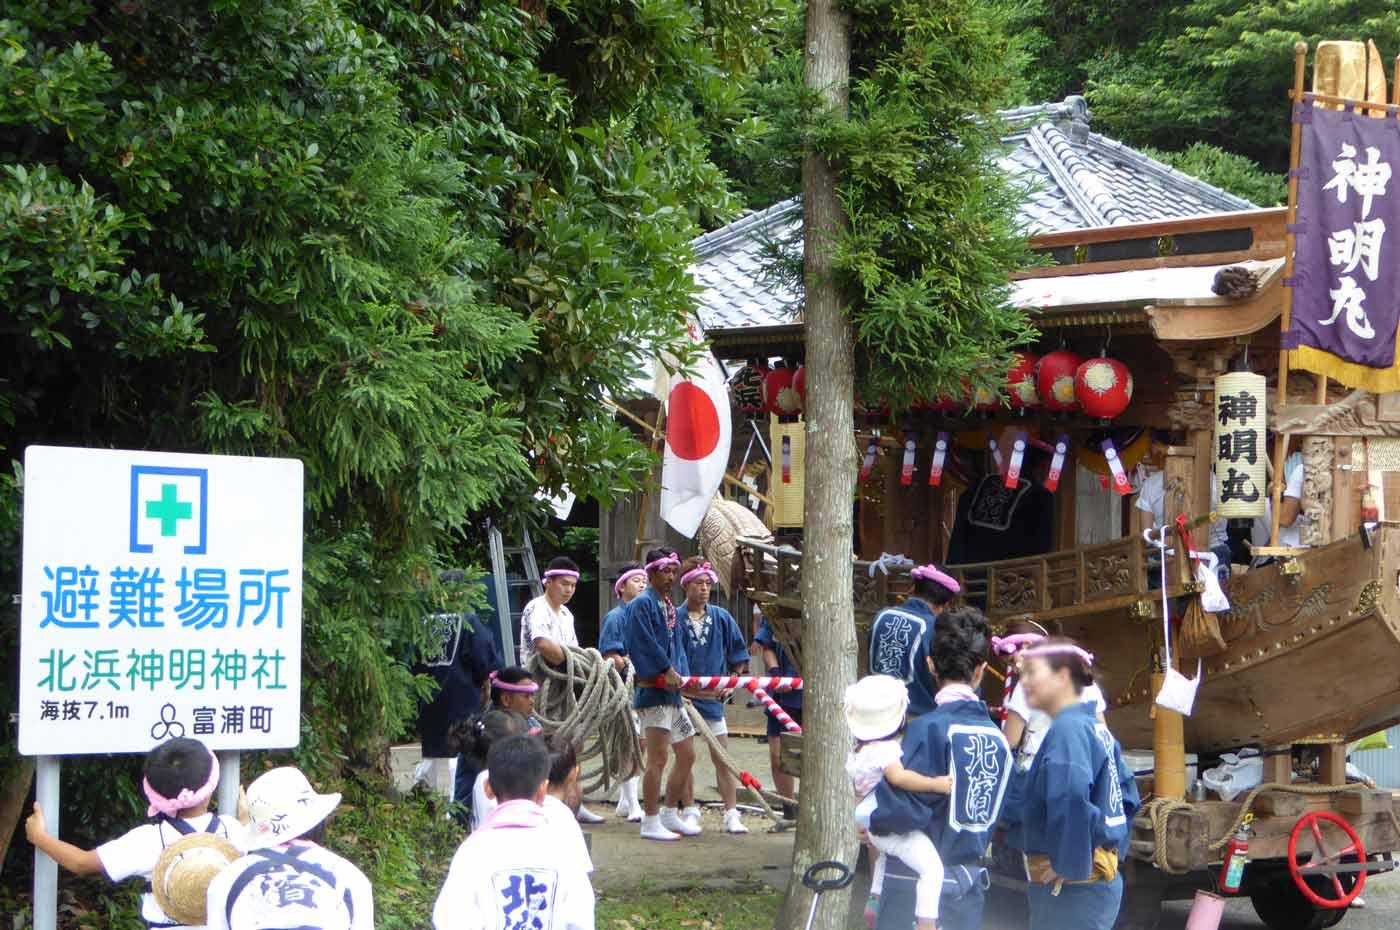 富浦の祭礼 北浜神社の明神丸